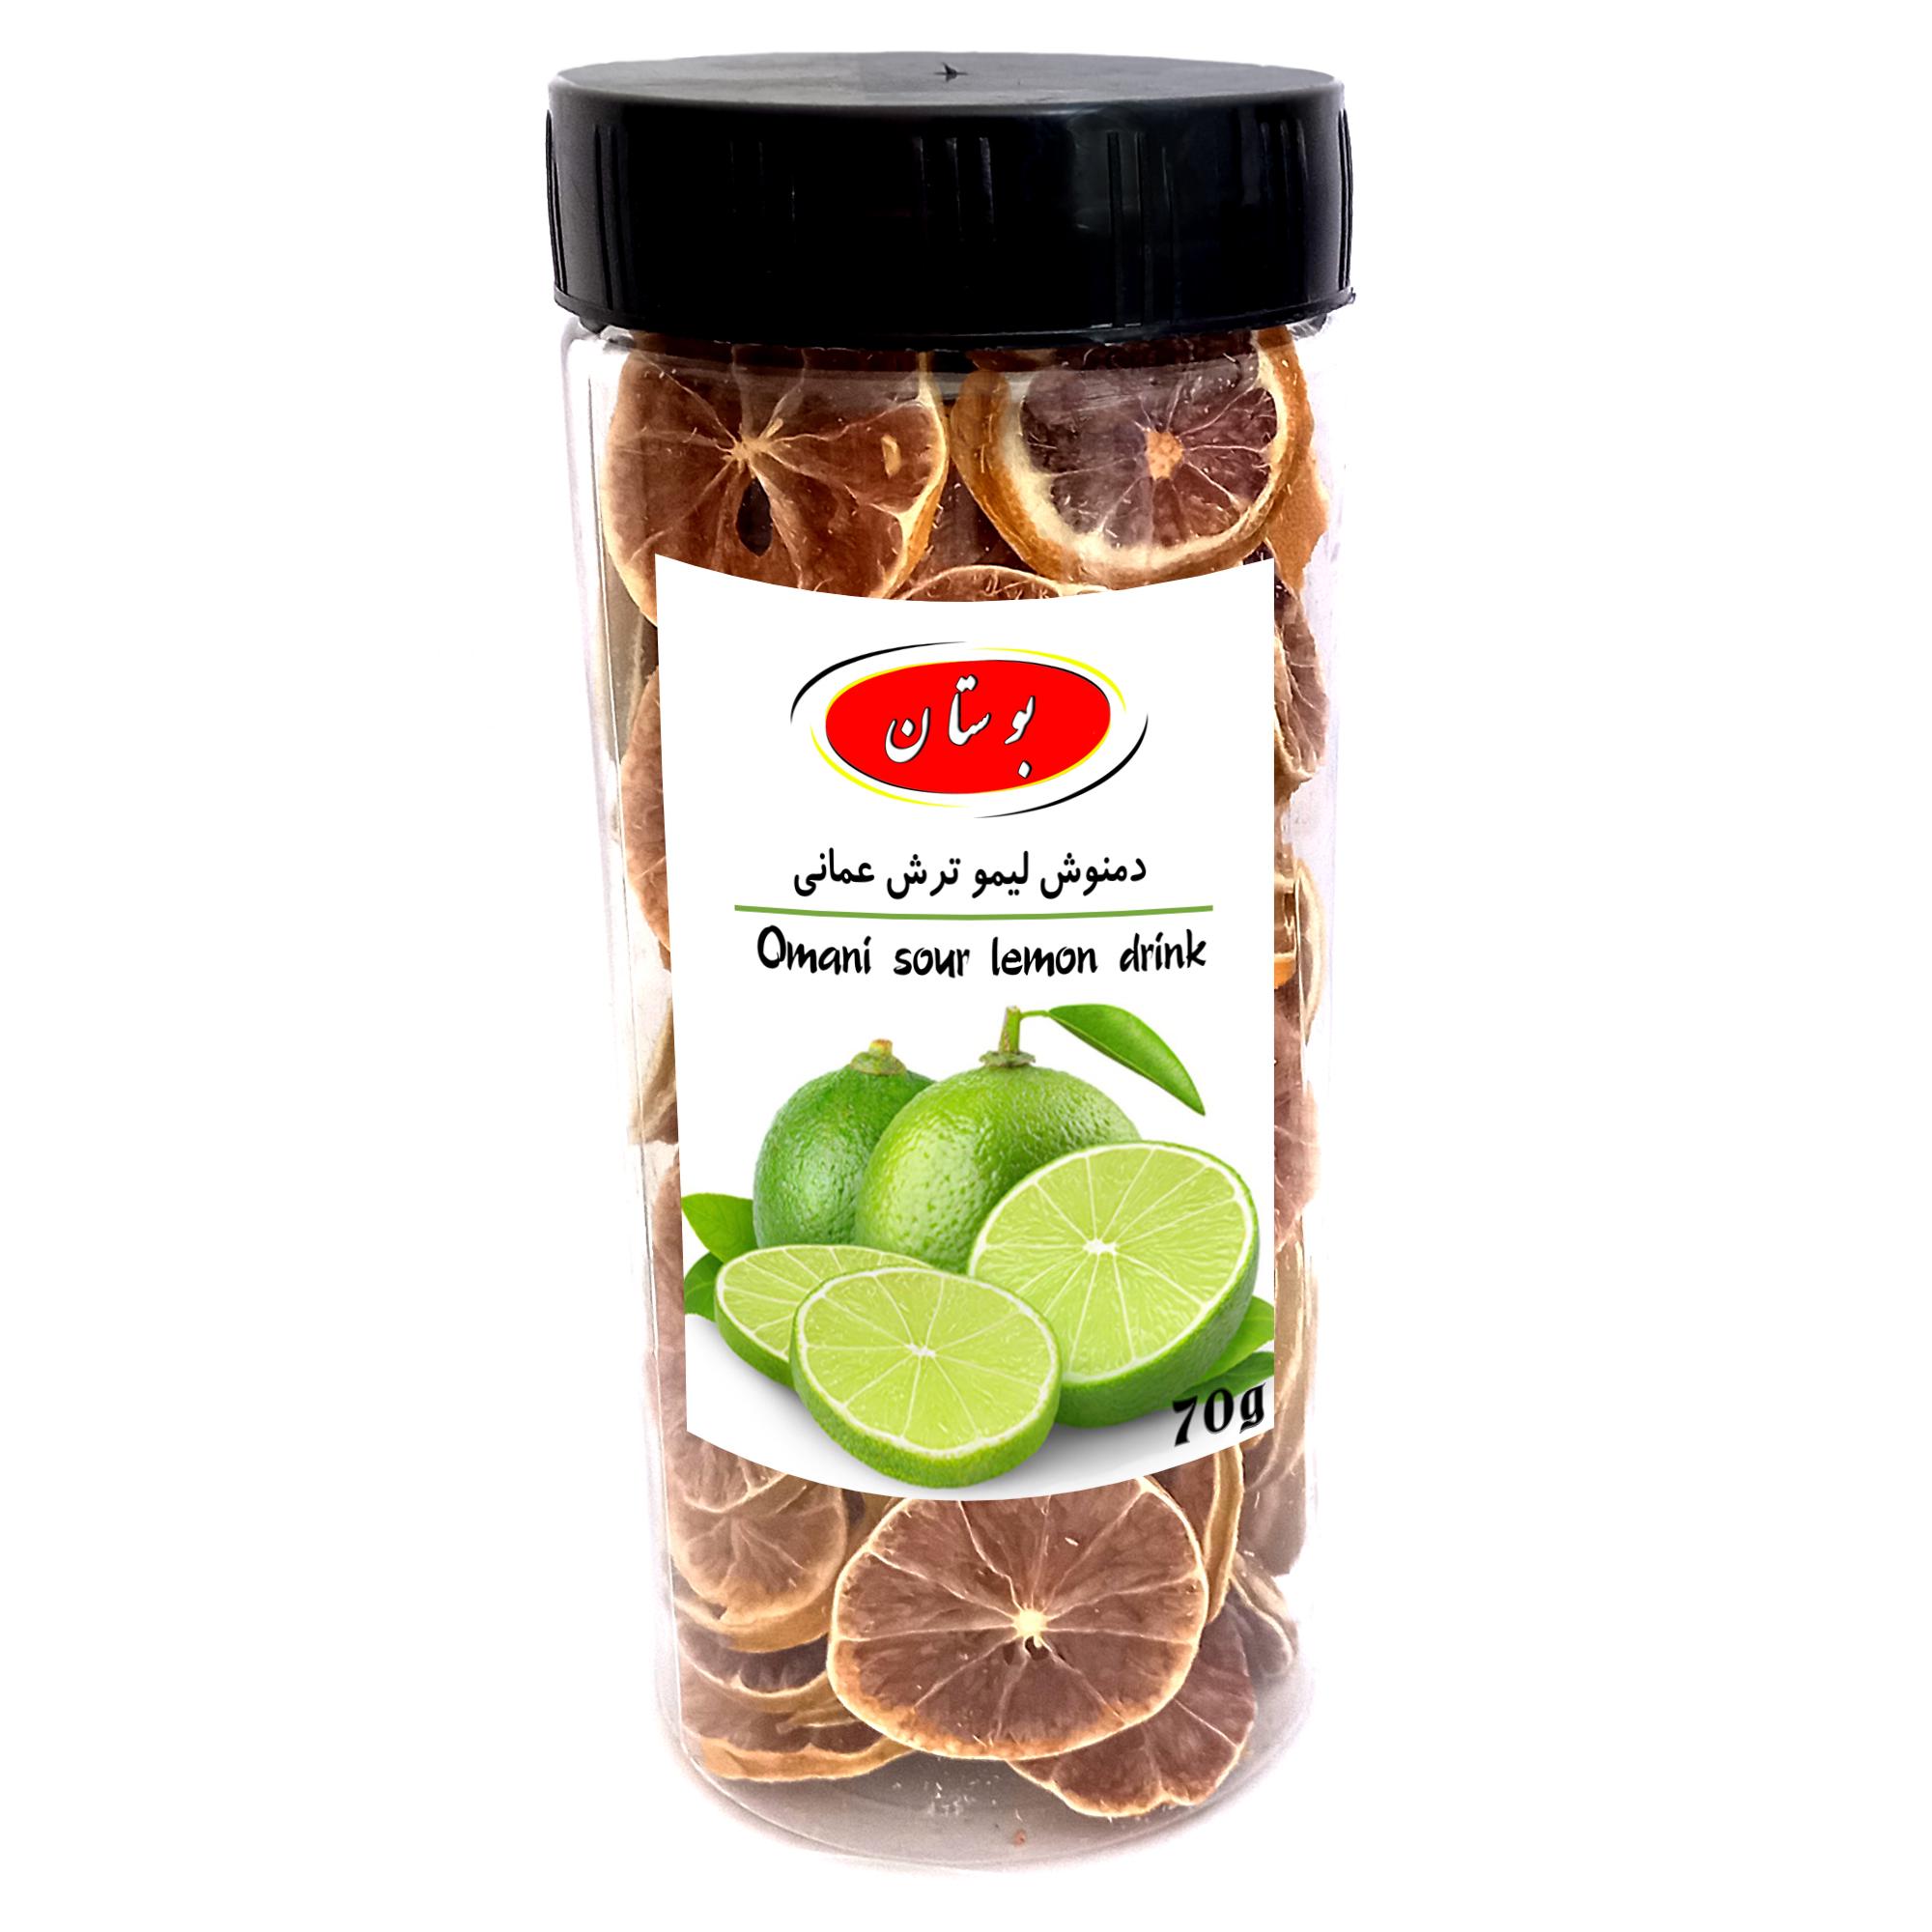 دمنوش لیمو ترش عمانی بوستان - 70 گرم